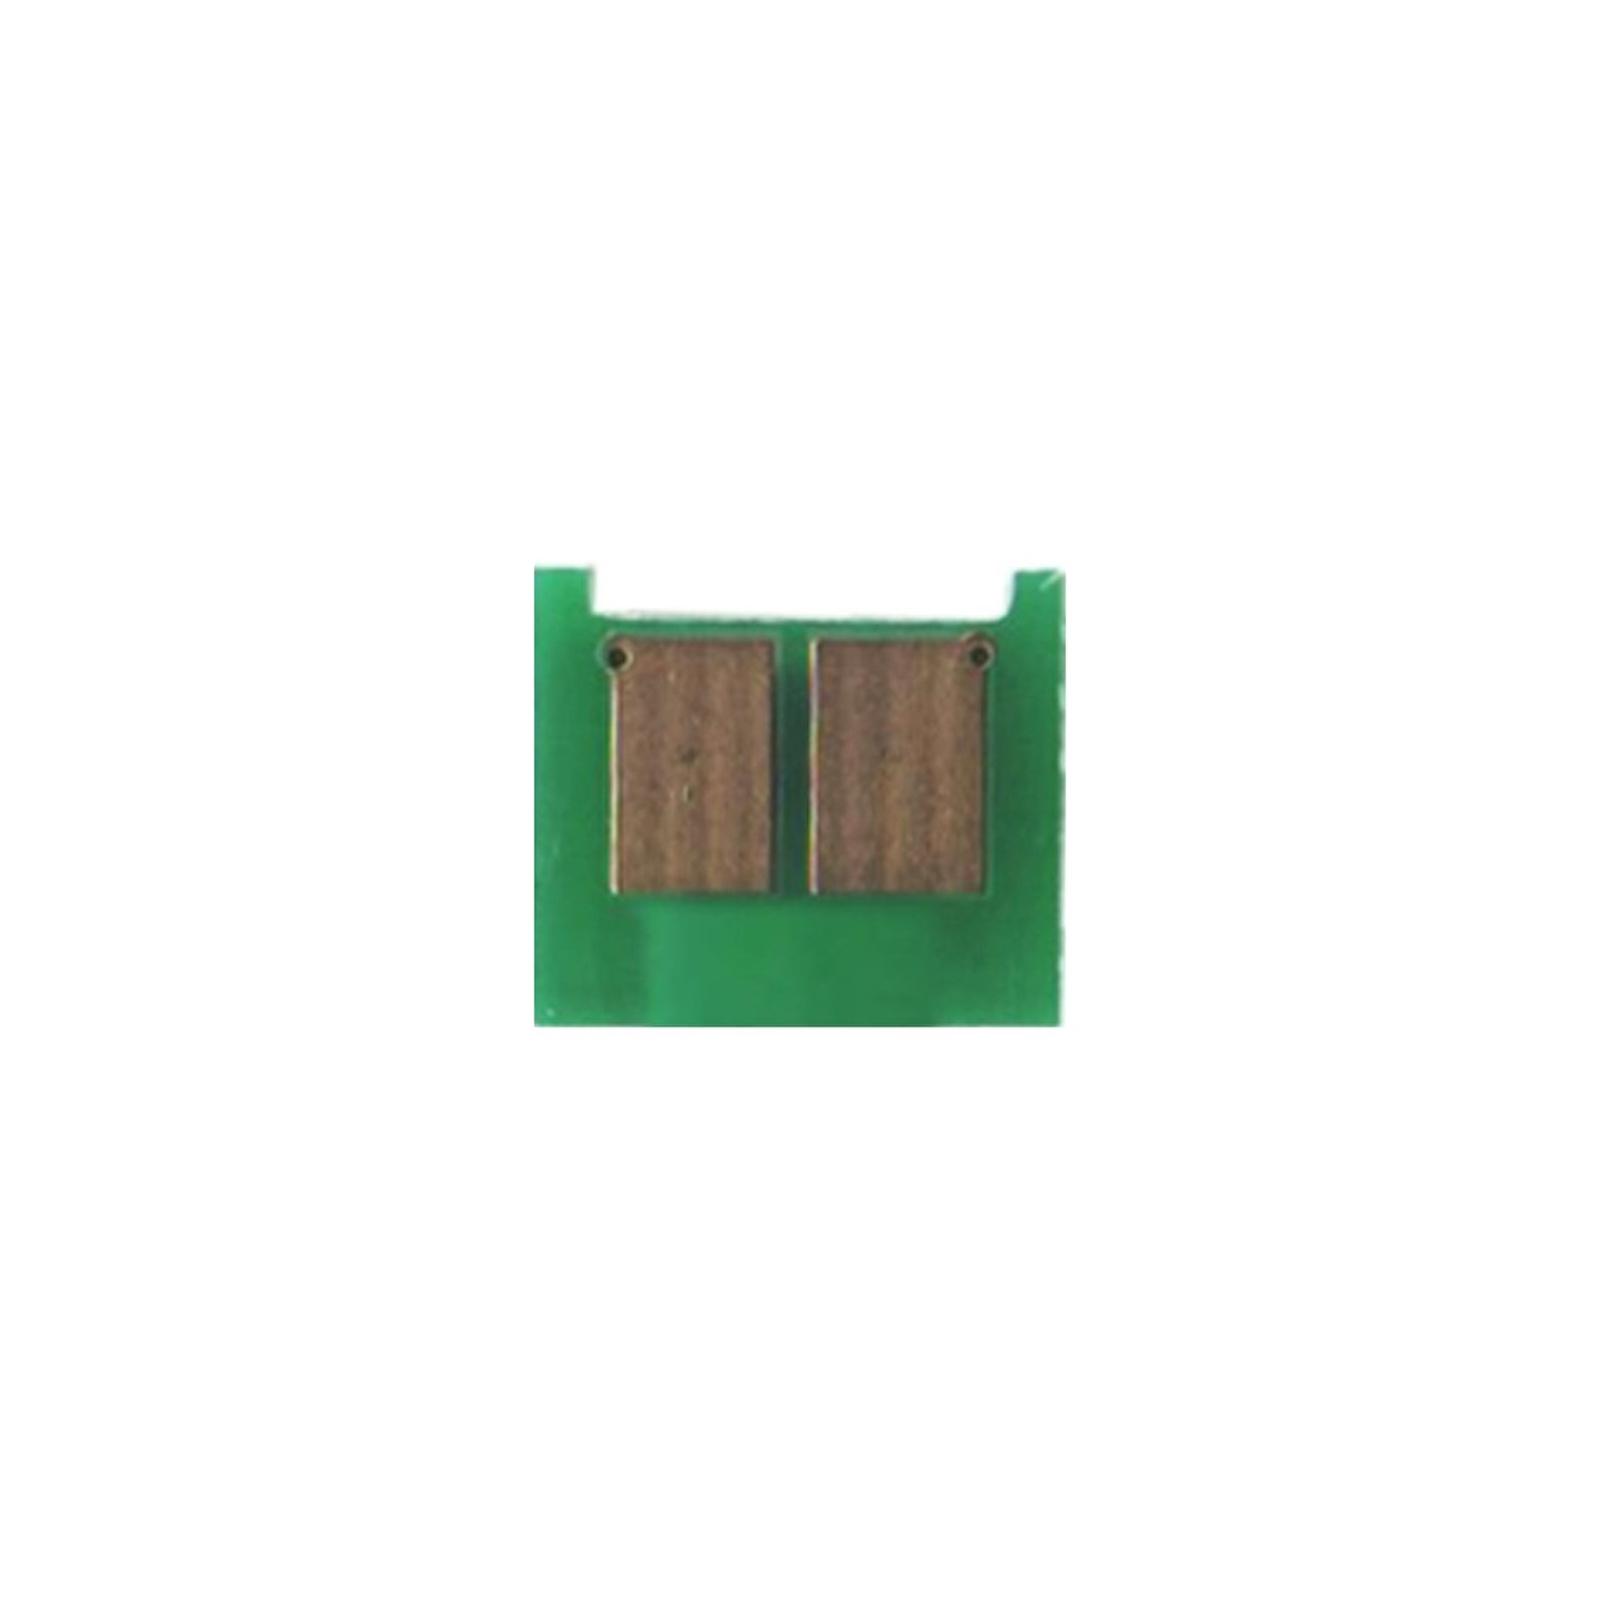 Чип для картриджа HP CLJ CP1025, M175/275 Magenta WELLCHIP (CHPJ10M)